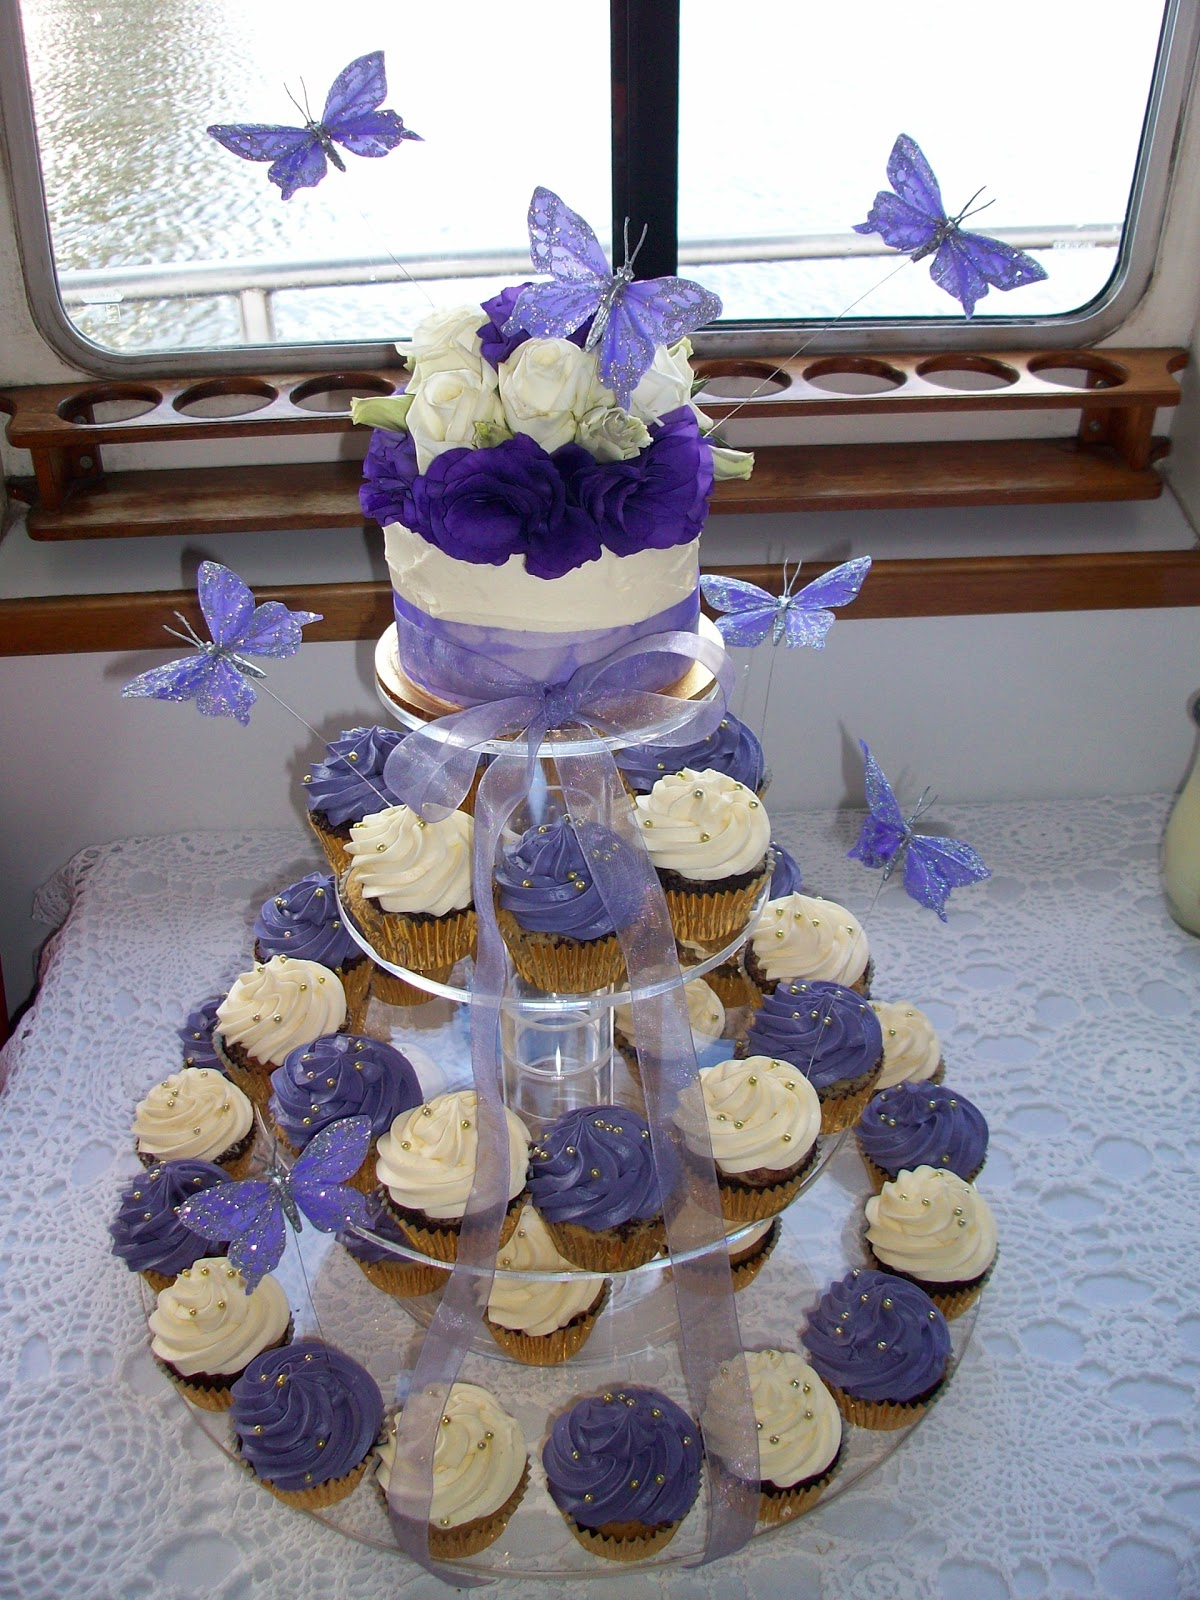 Wedding Cakes Pictures: Purple Wedding Cupcakes